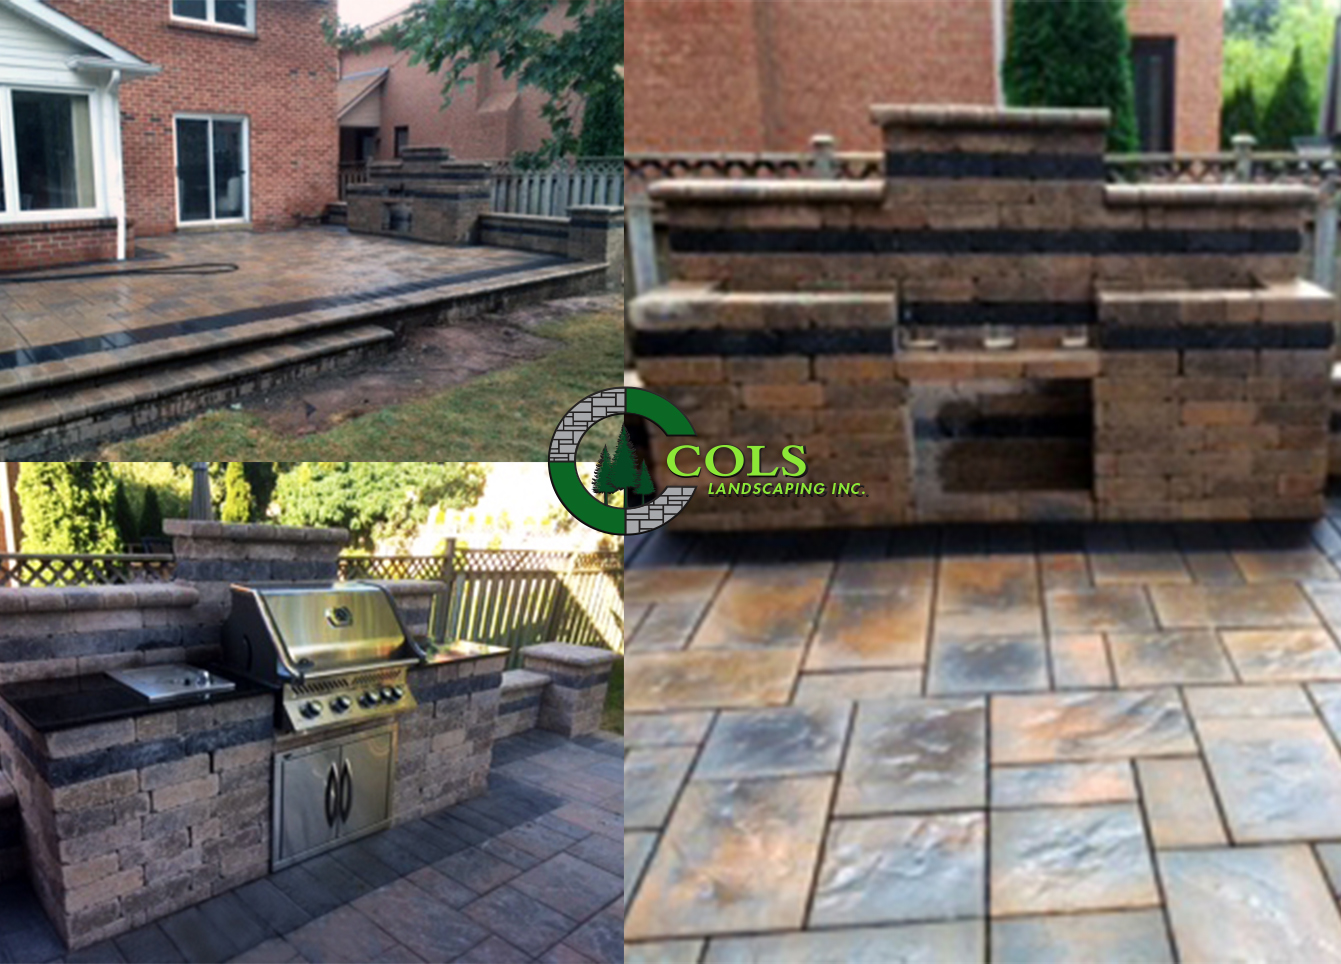 COLS outdoor kitchen design idea